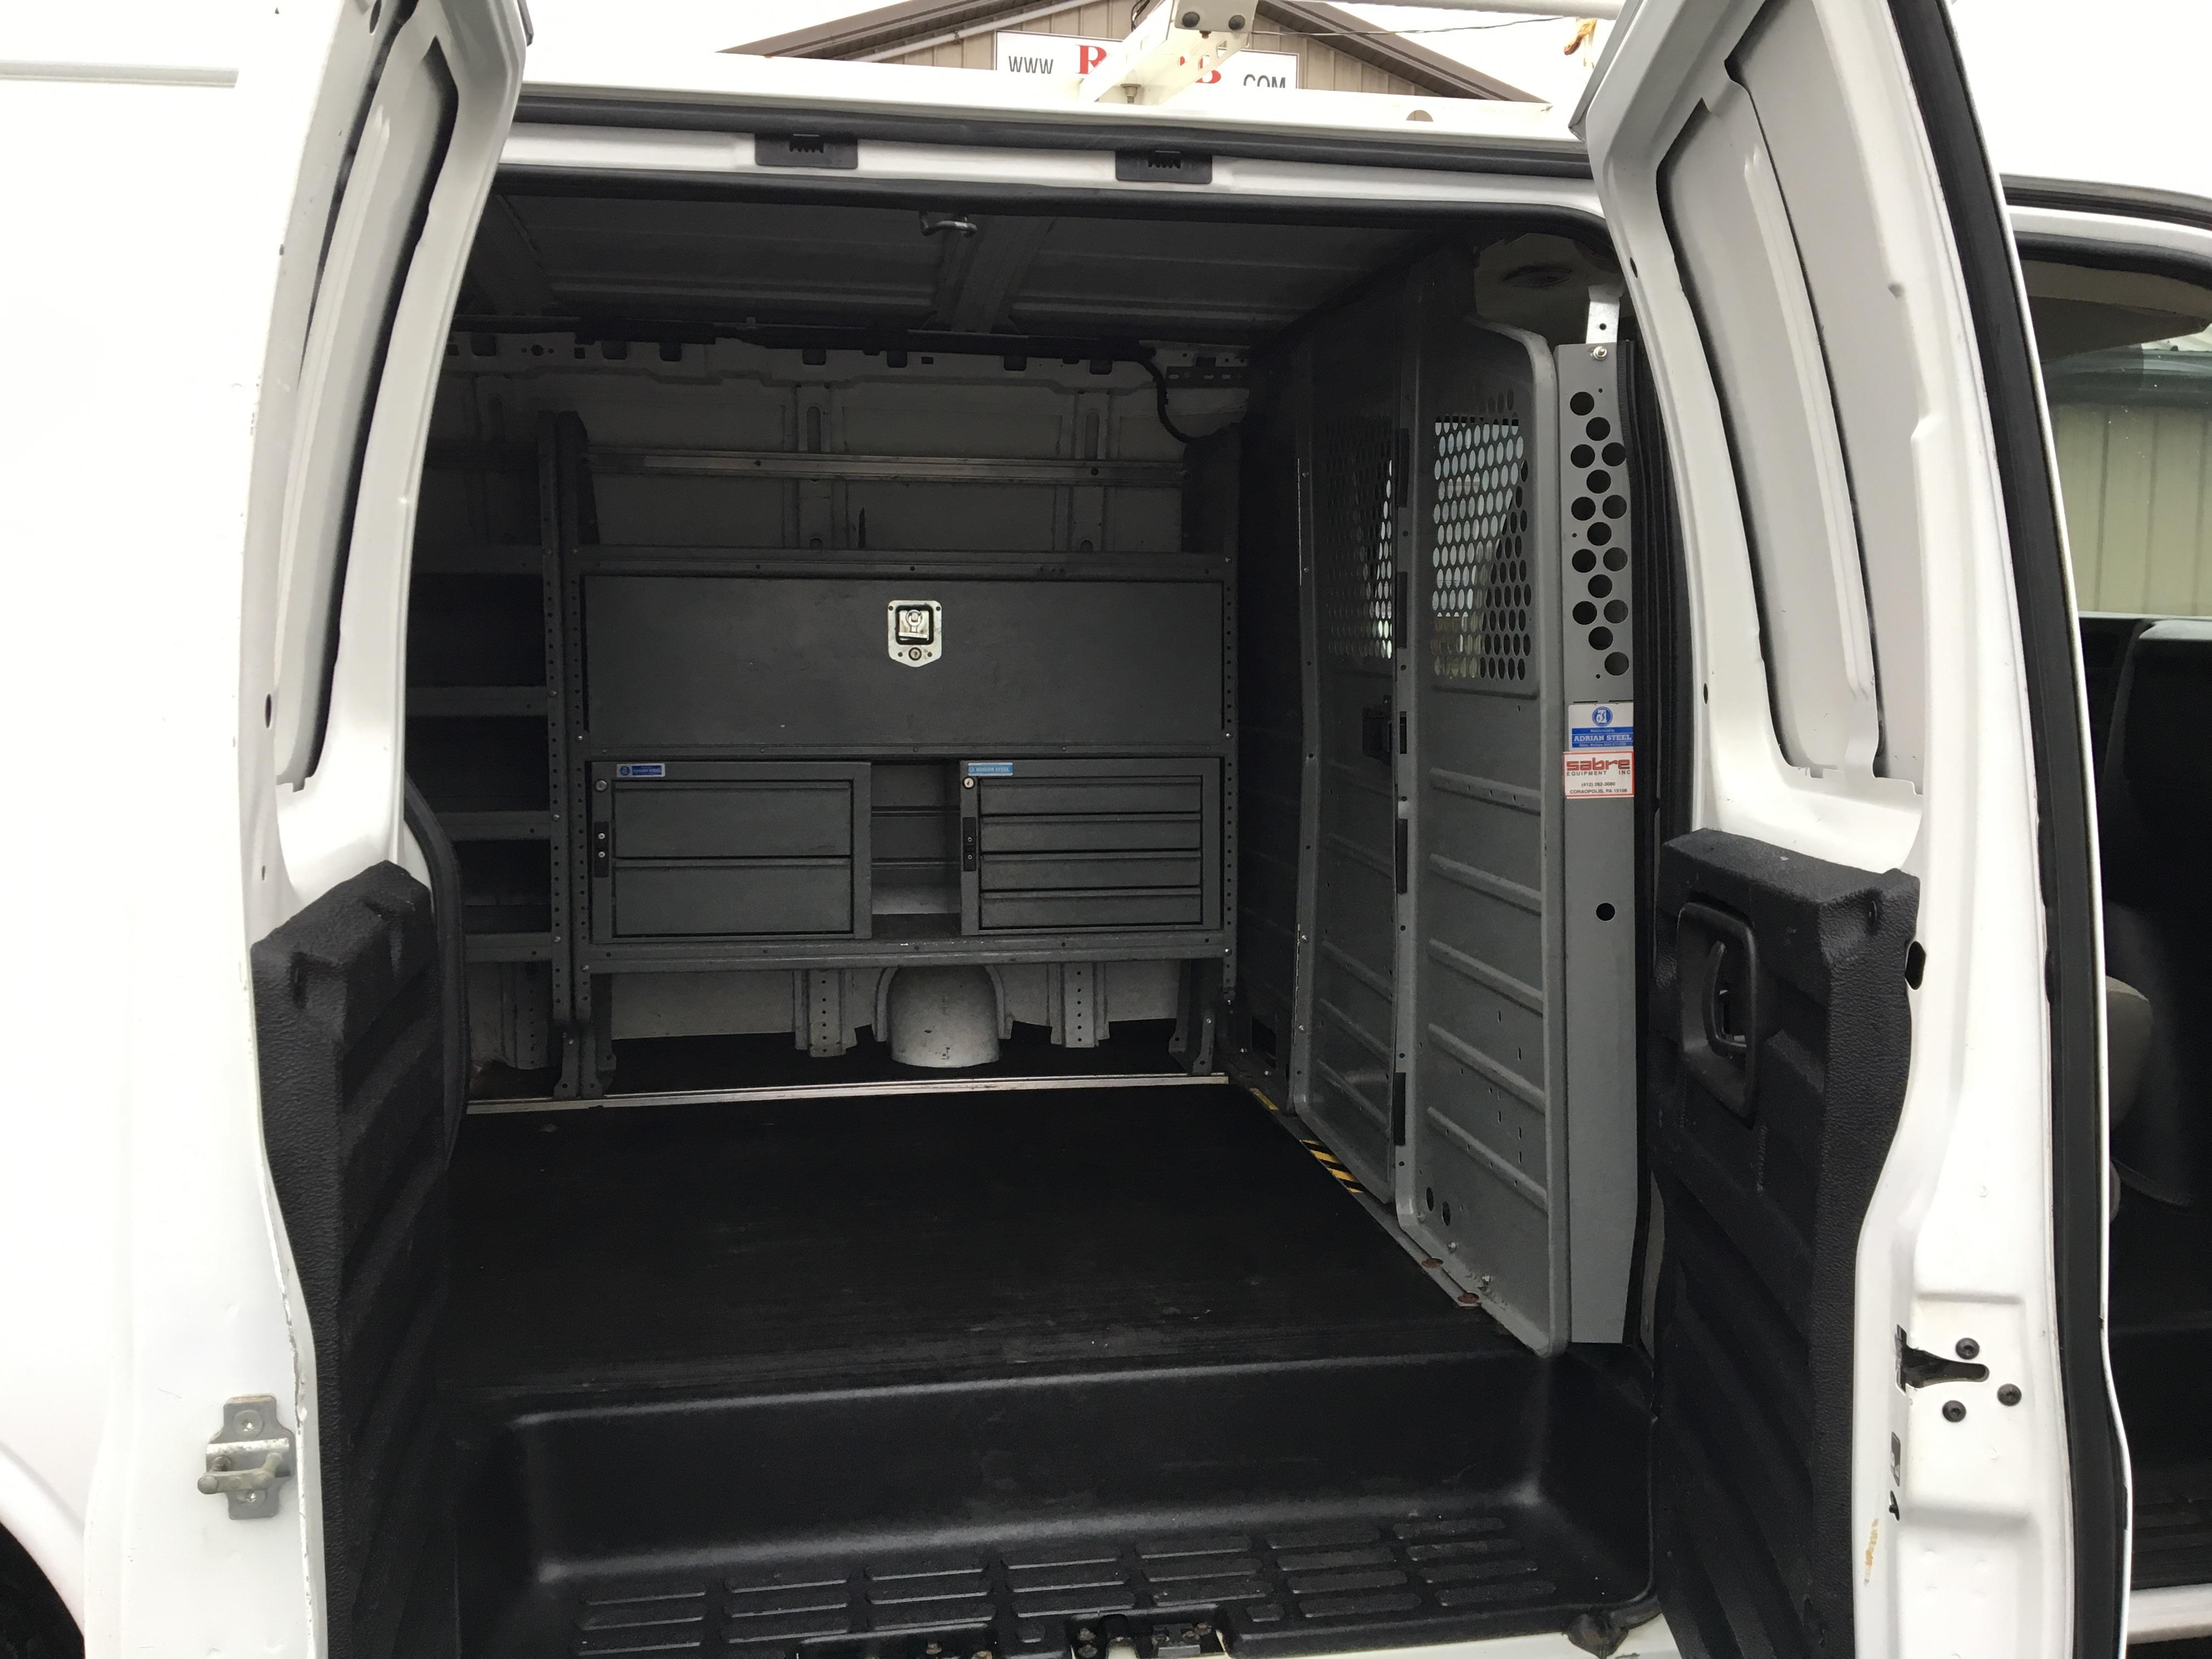 2011 Chevrolet Express 2500 Cargo Vn